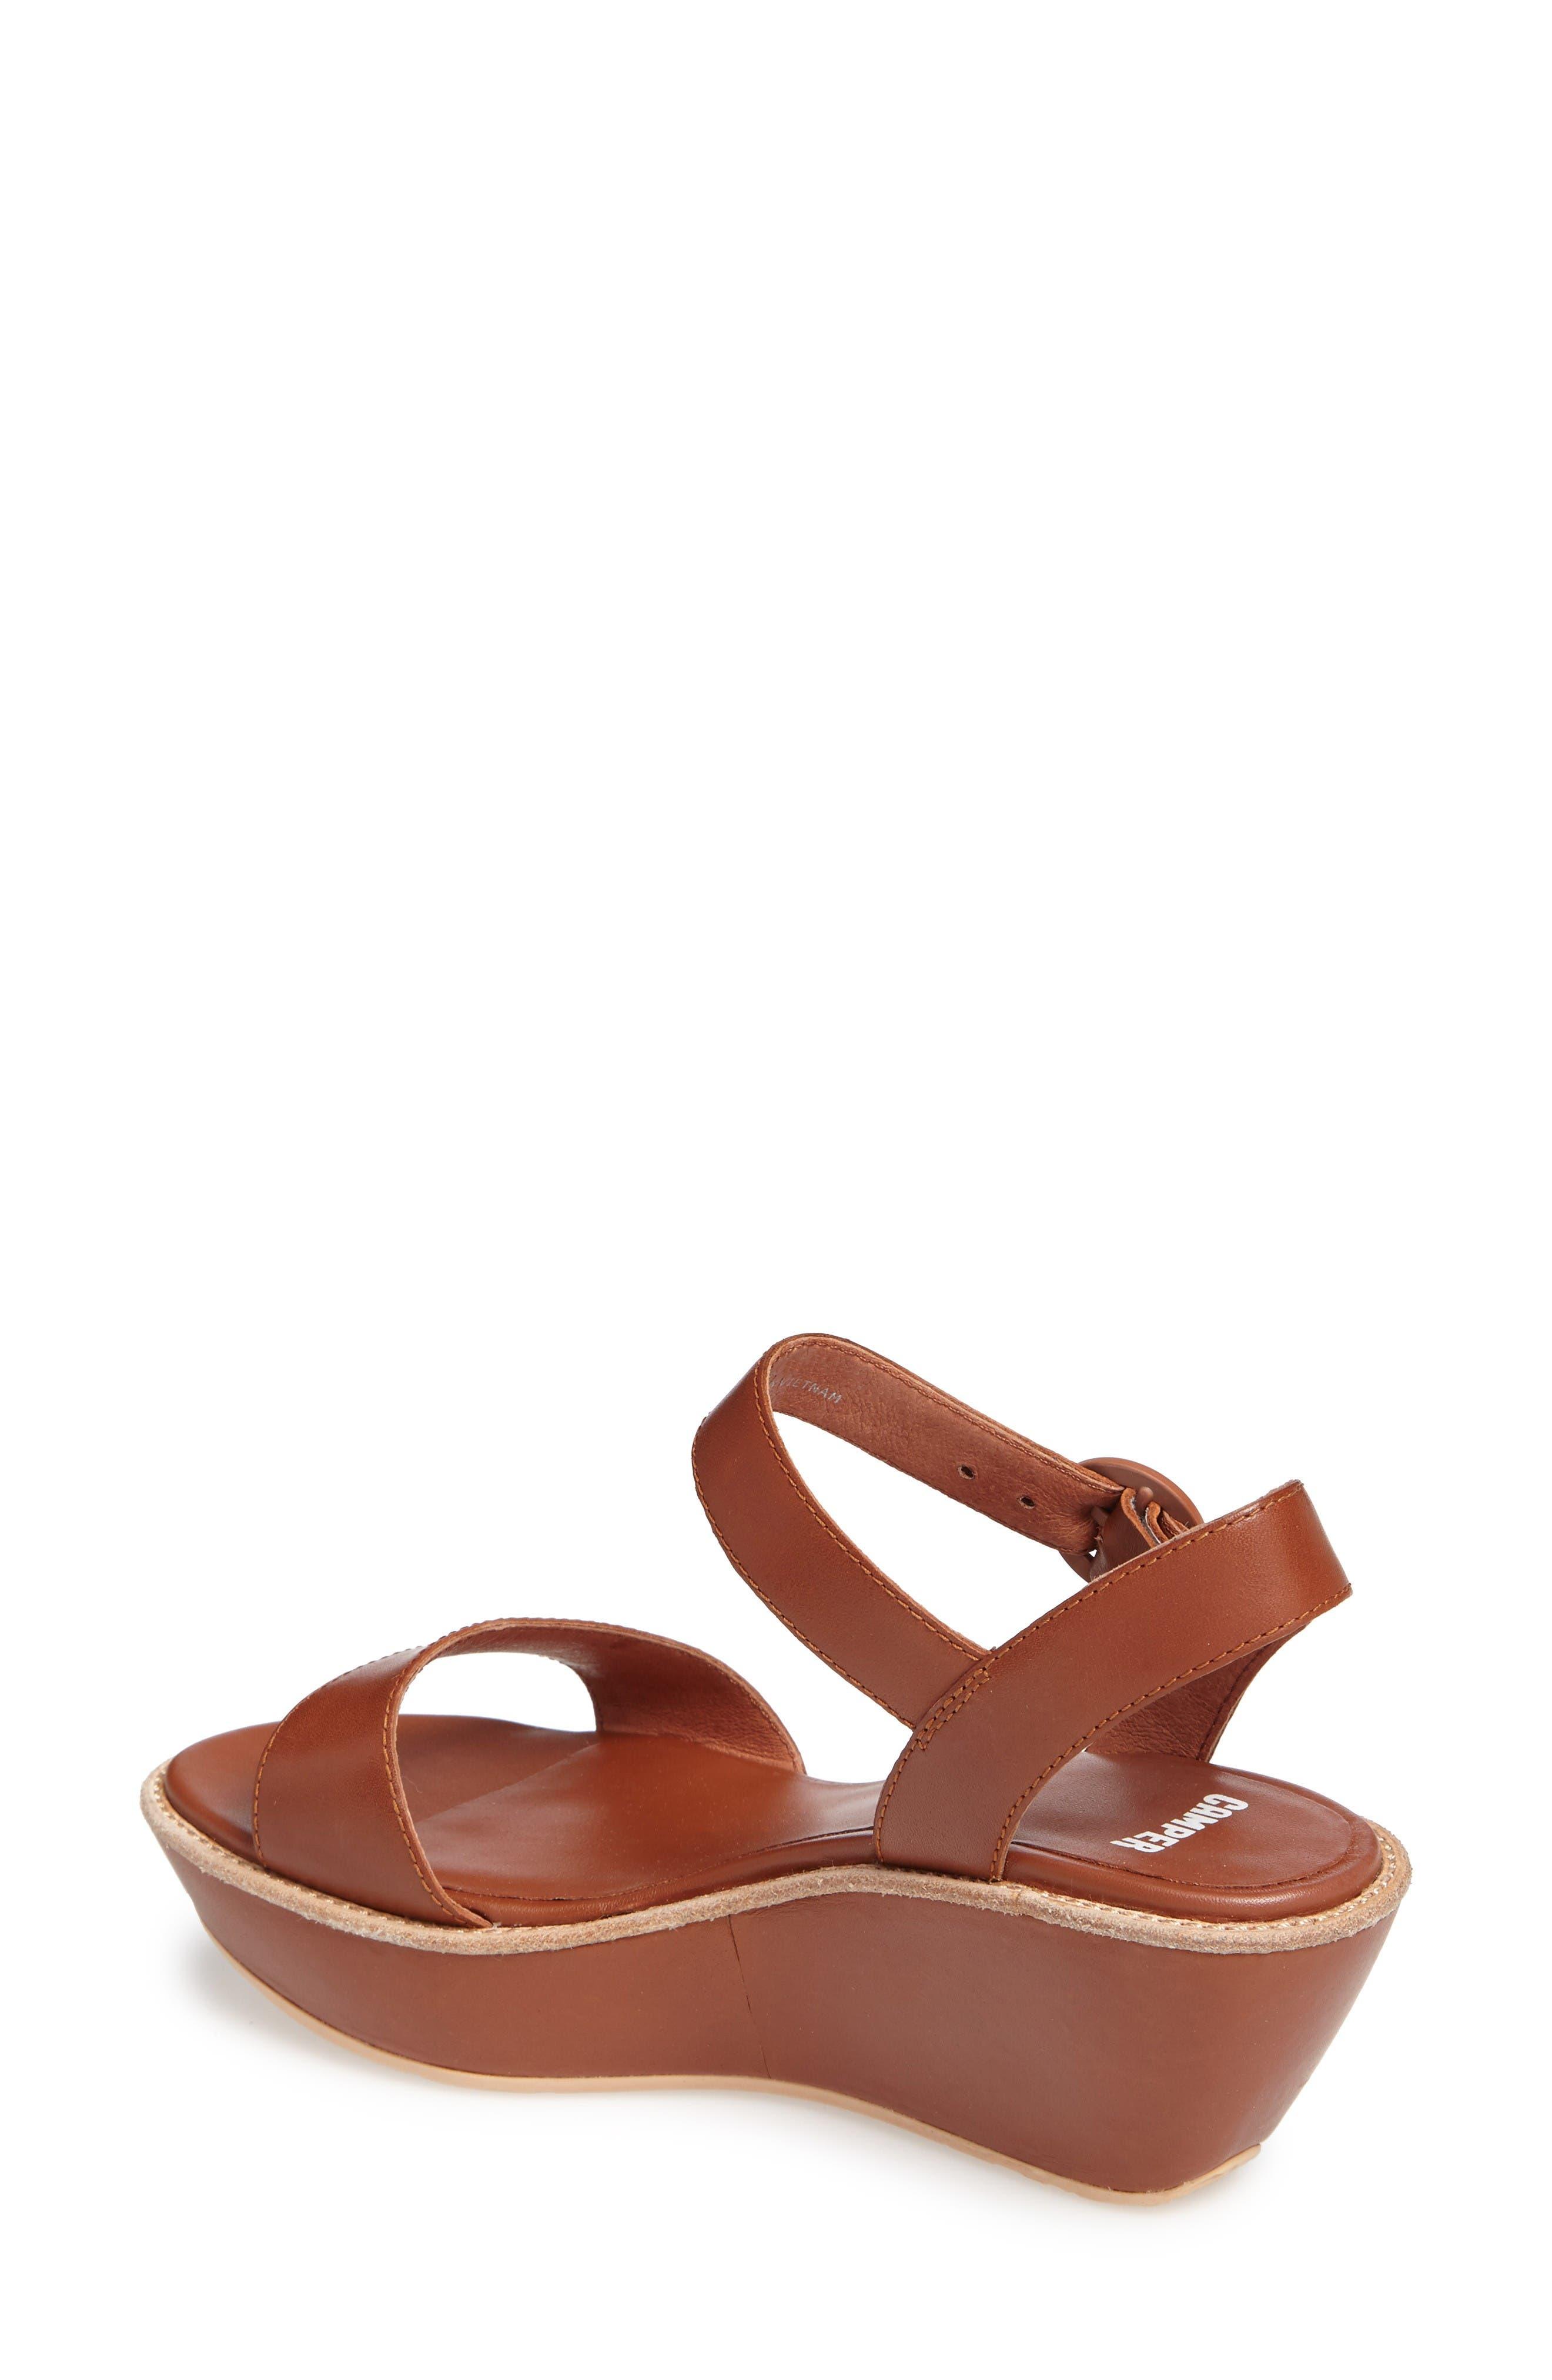 'Damas' Wedge Sandal,                             Alternate thumbnail 2, color,                             Brown Leather